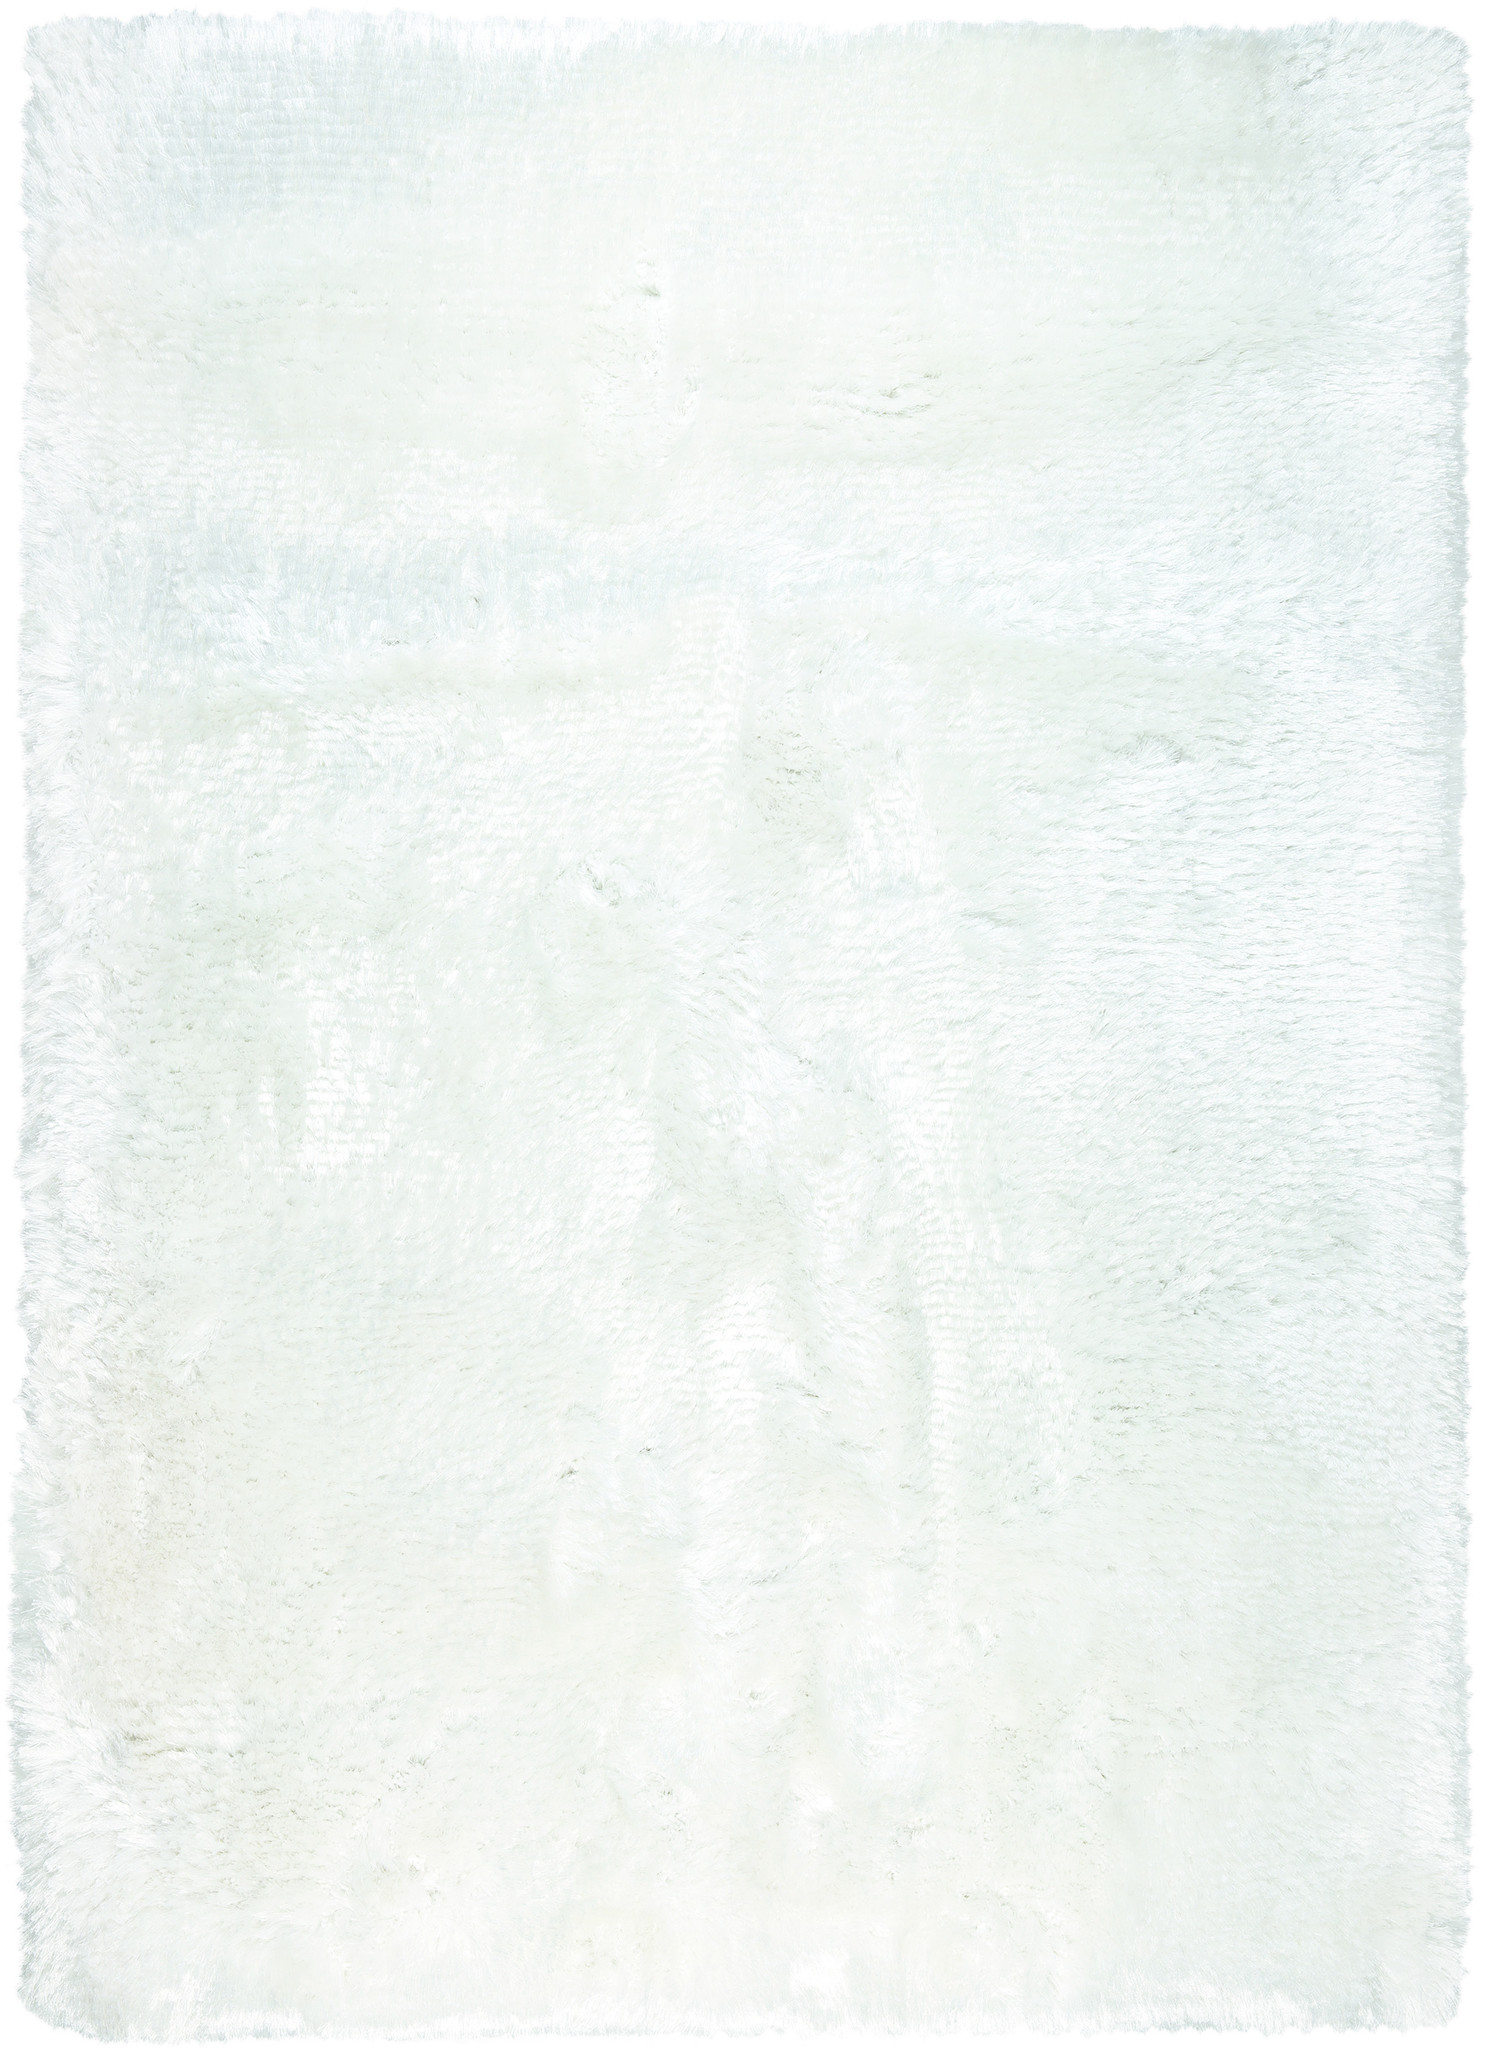 Vloerkleed Adore 100 170x240cm-1